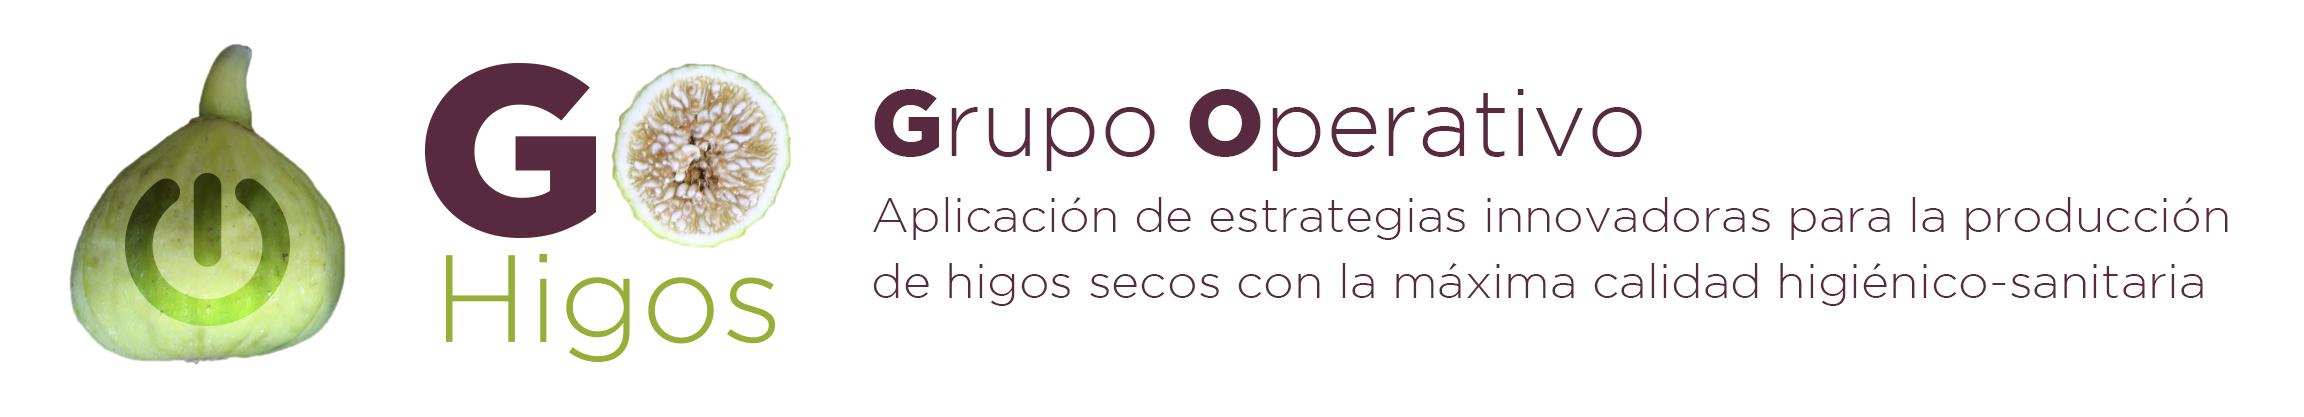 Grupo Operativo del Higo Logo